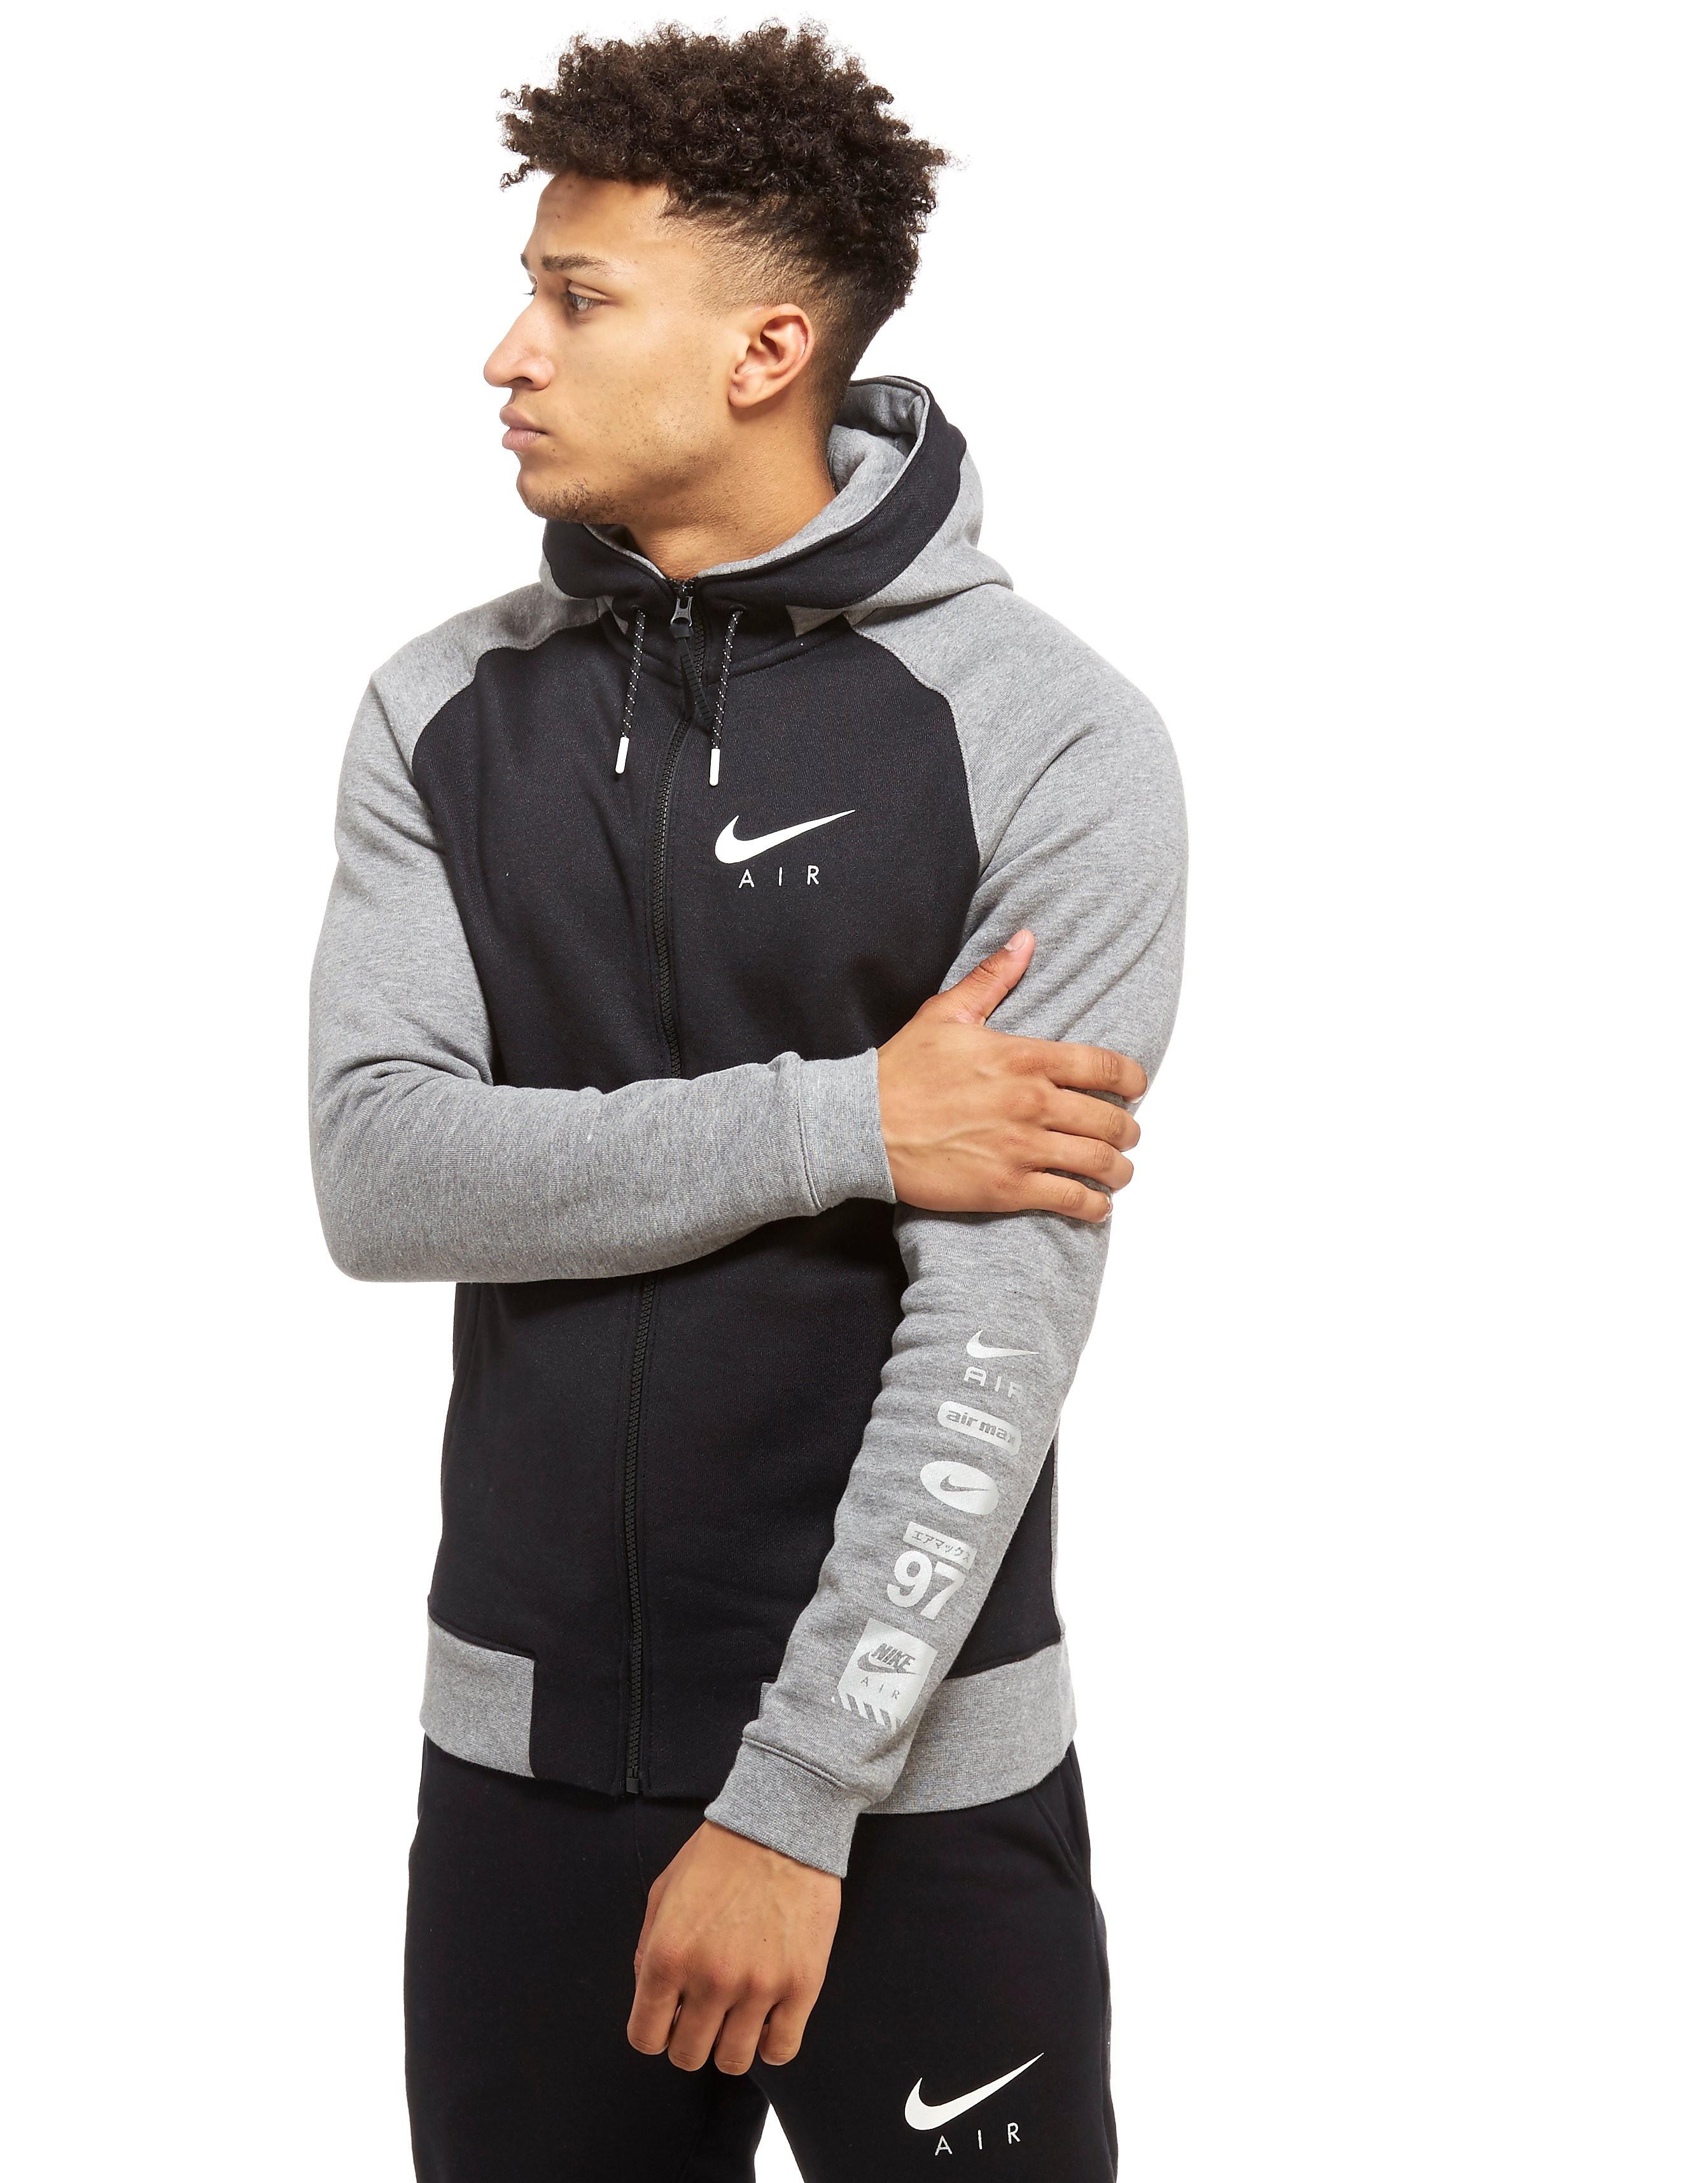 Nike Sweat à capuche Air Homme